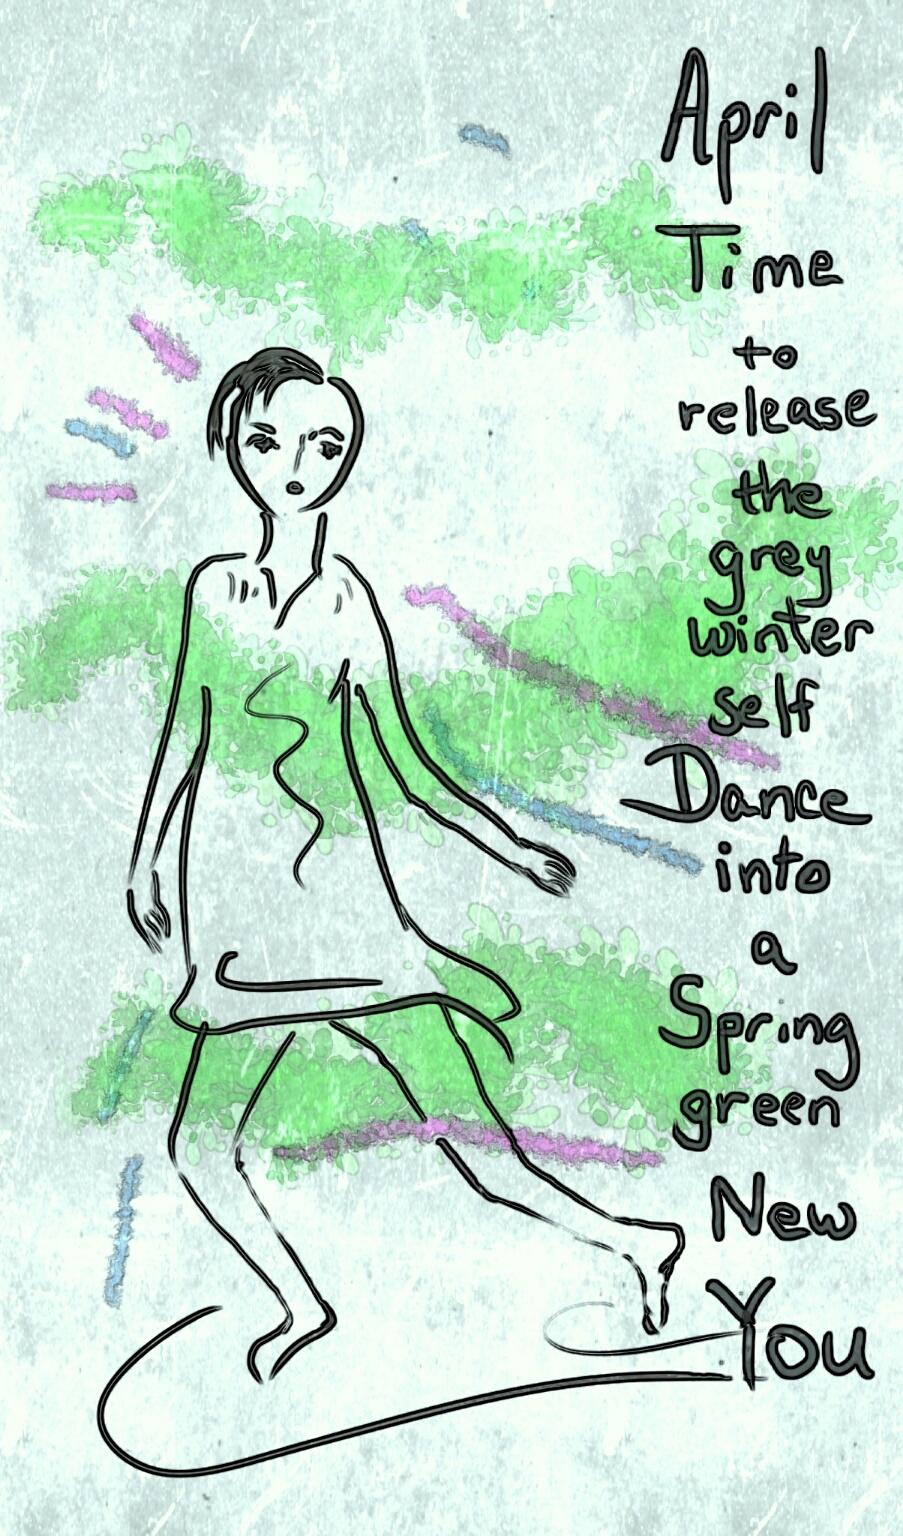 spring green 3 (1).jpeg